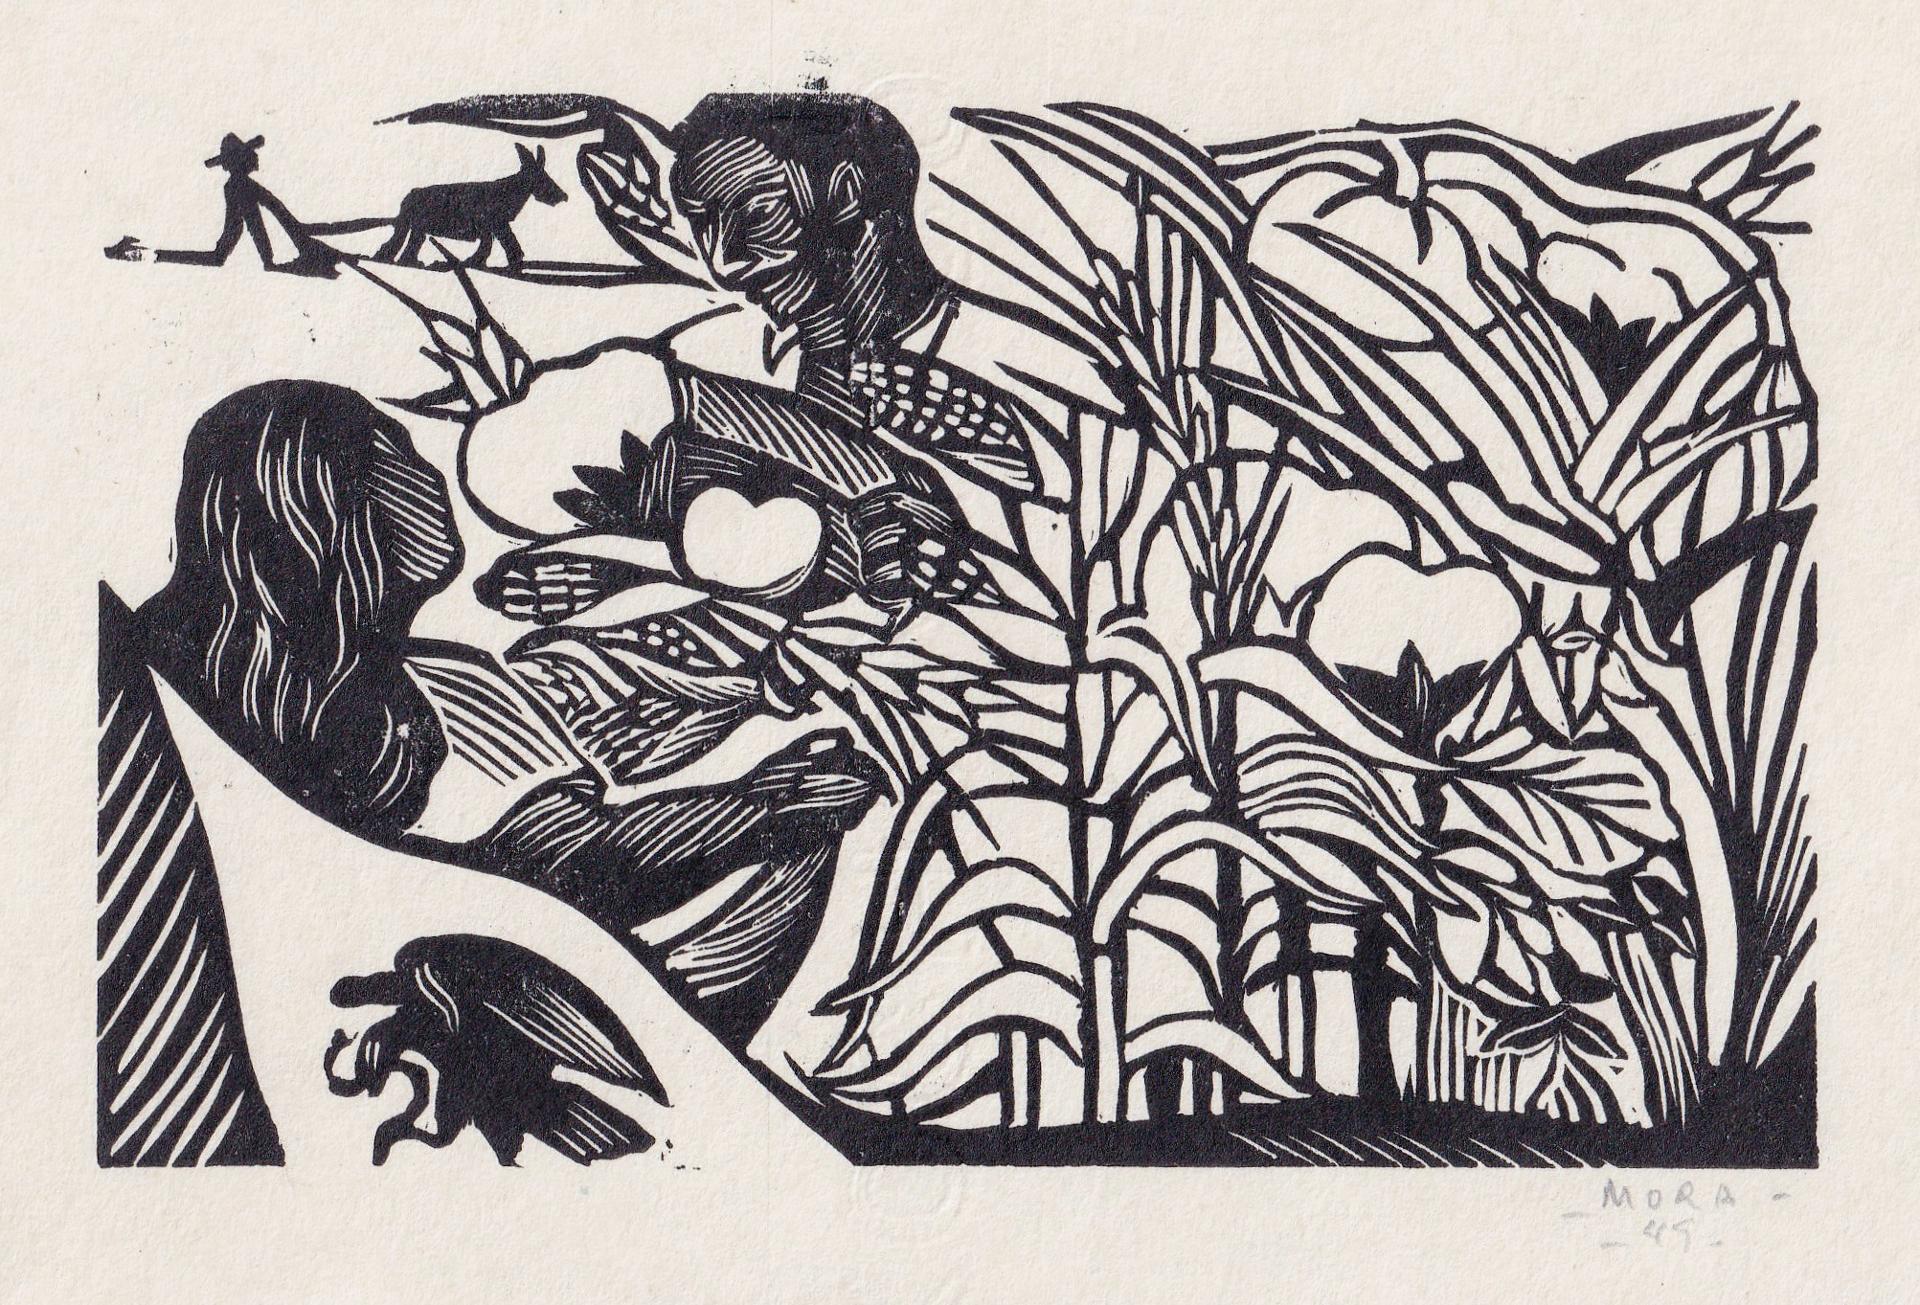 Cosecha by Francisco Mora (1922 - 2002)